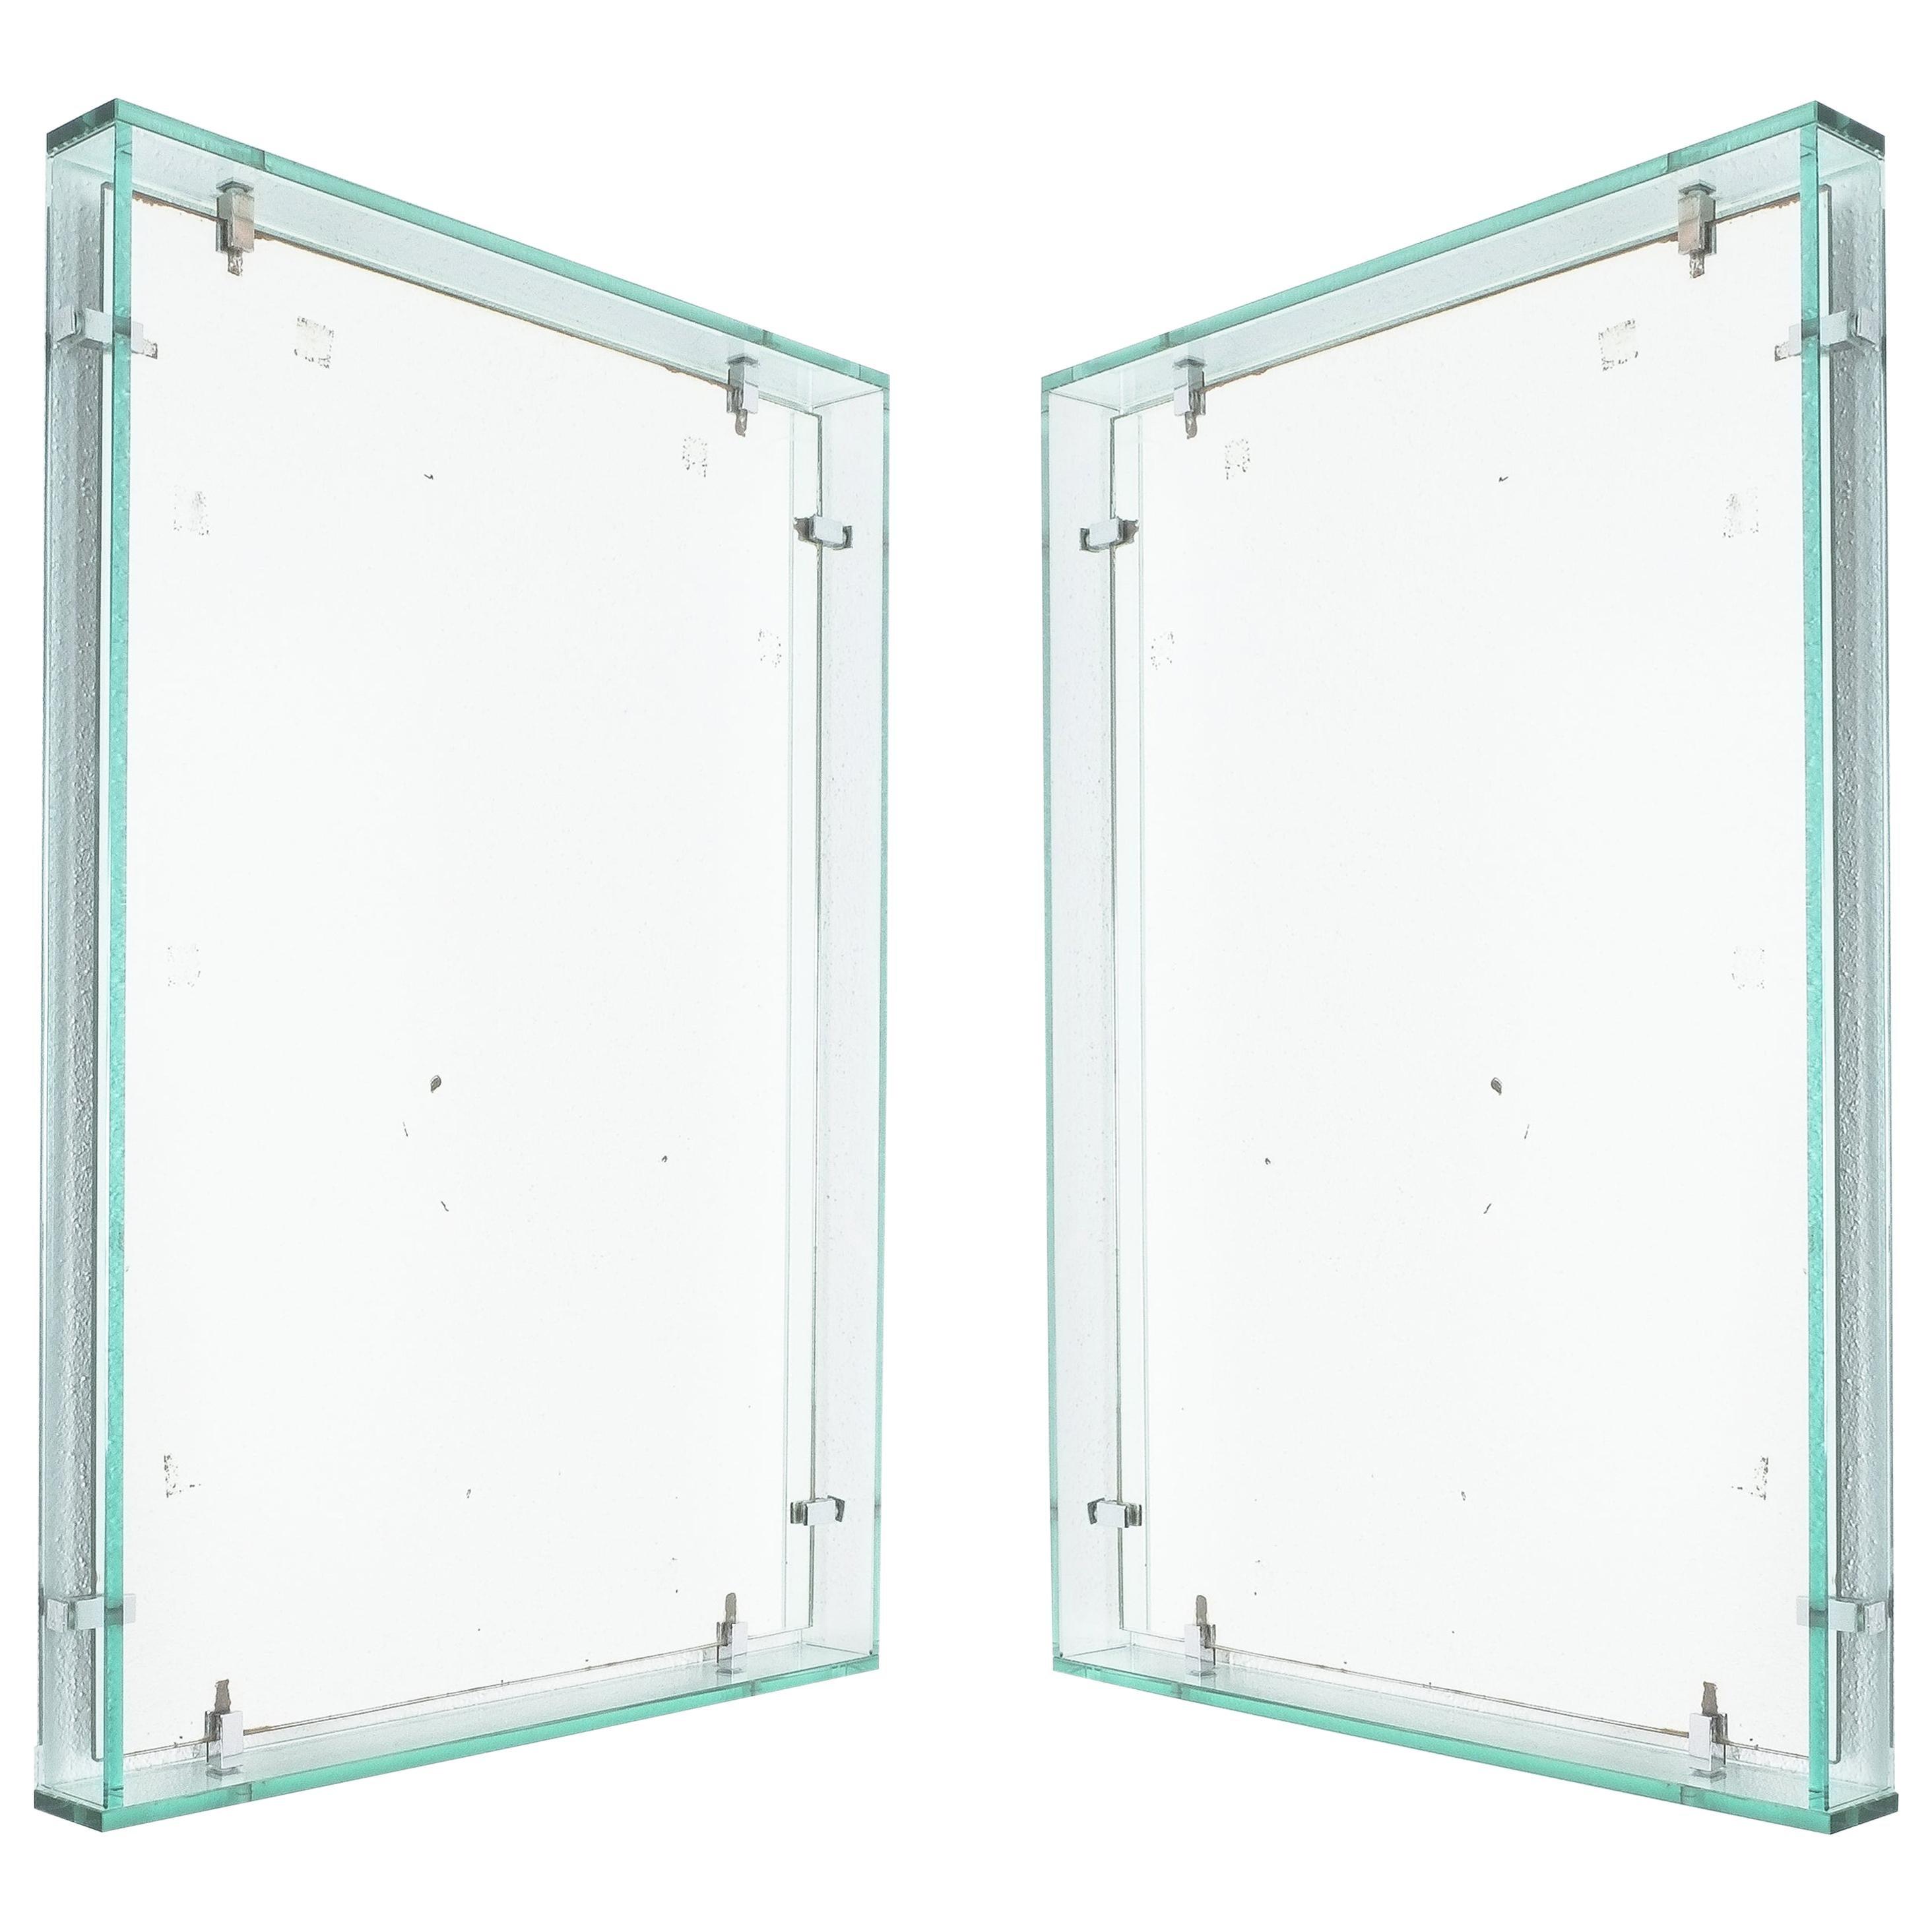 Fontana Arte Model 2014 Rectangular Floating Glass Mirrors, One of Two, 1960